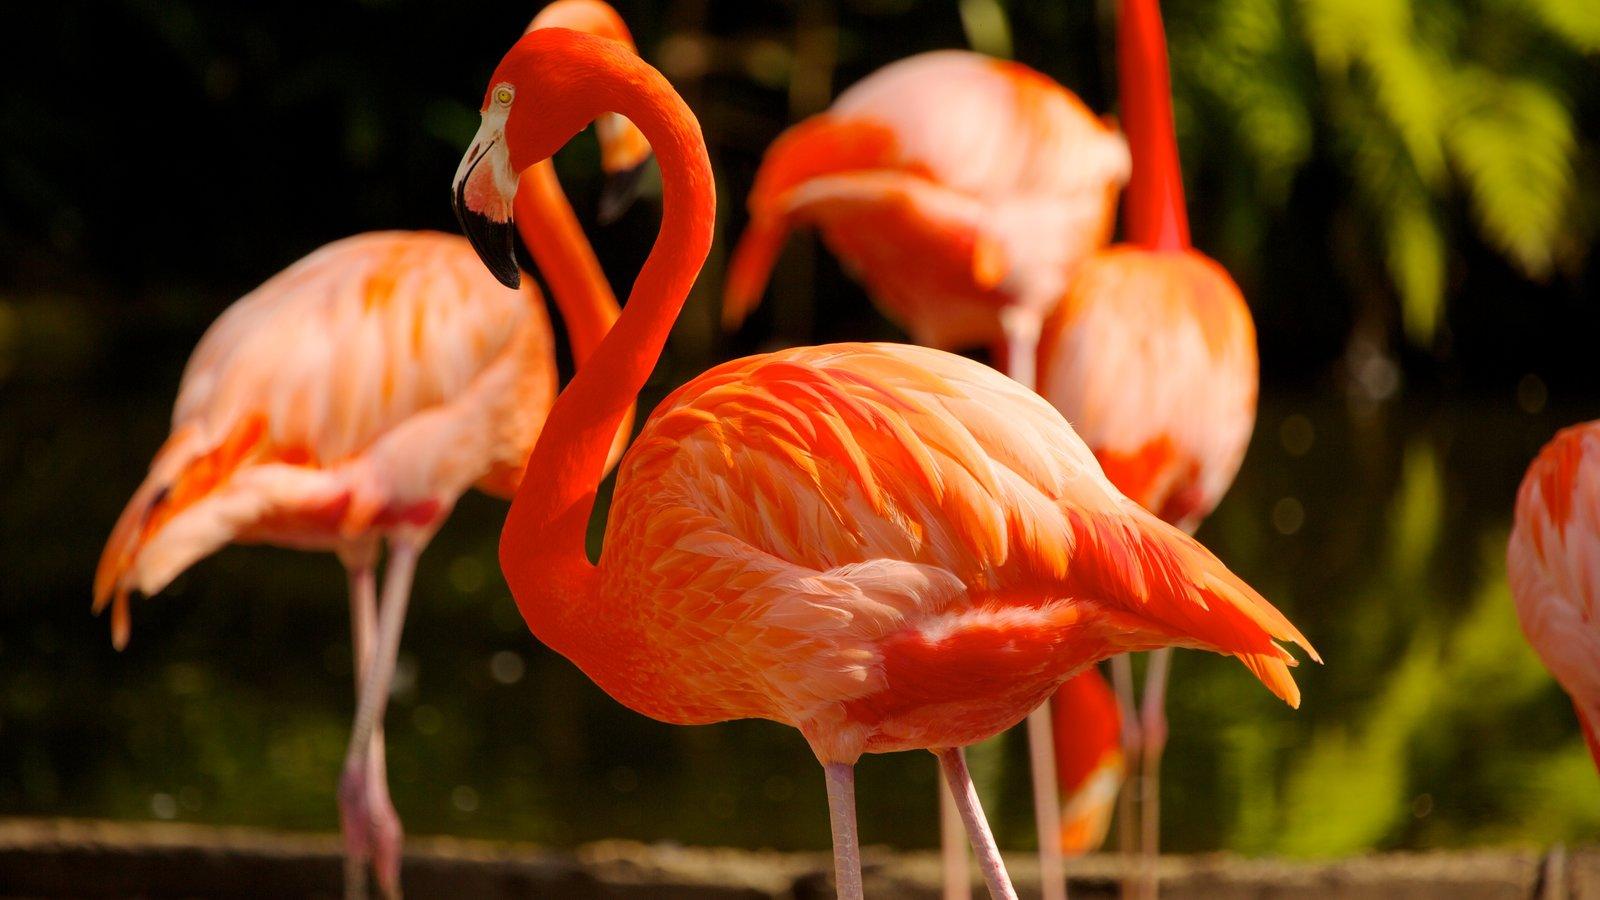 Flamingo Gardens showing zoo animals and bird life